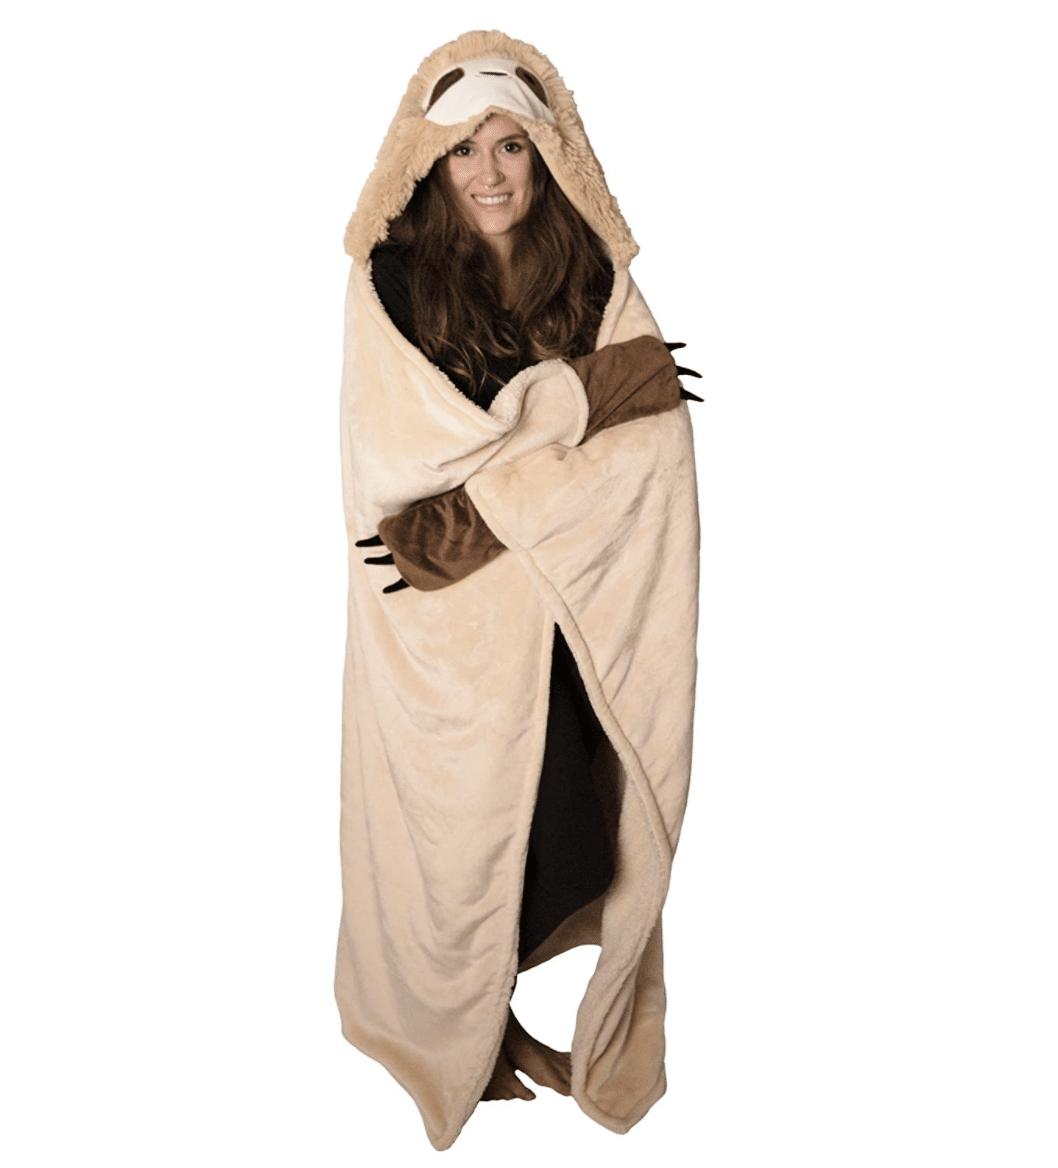 sloth-gifts-blanket